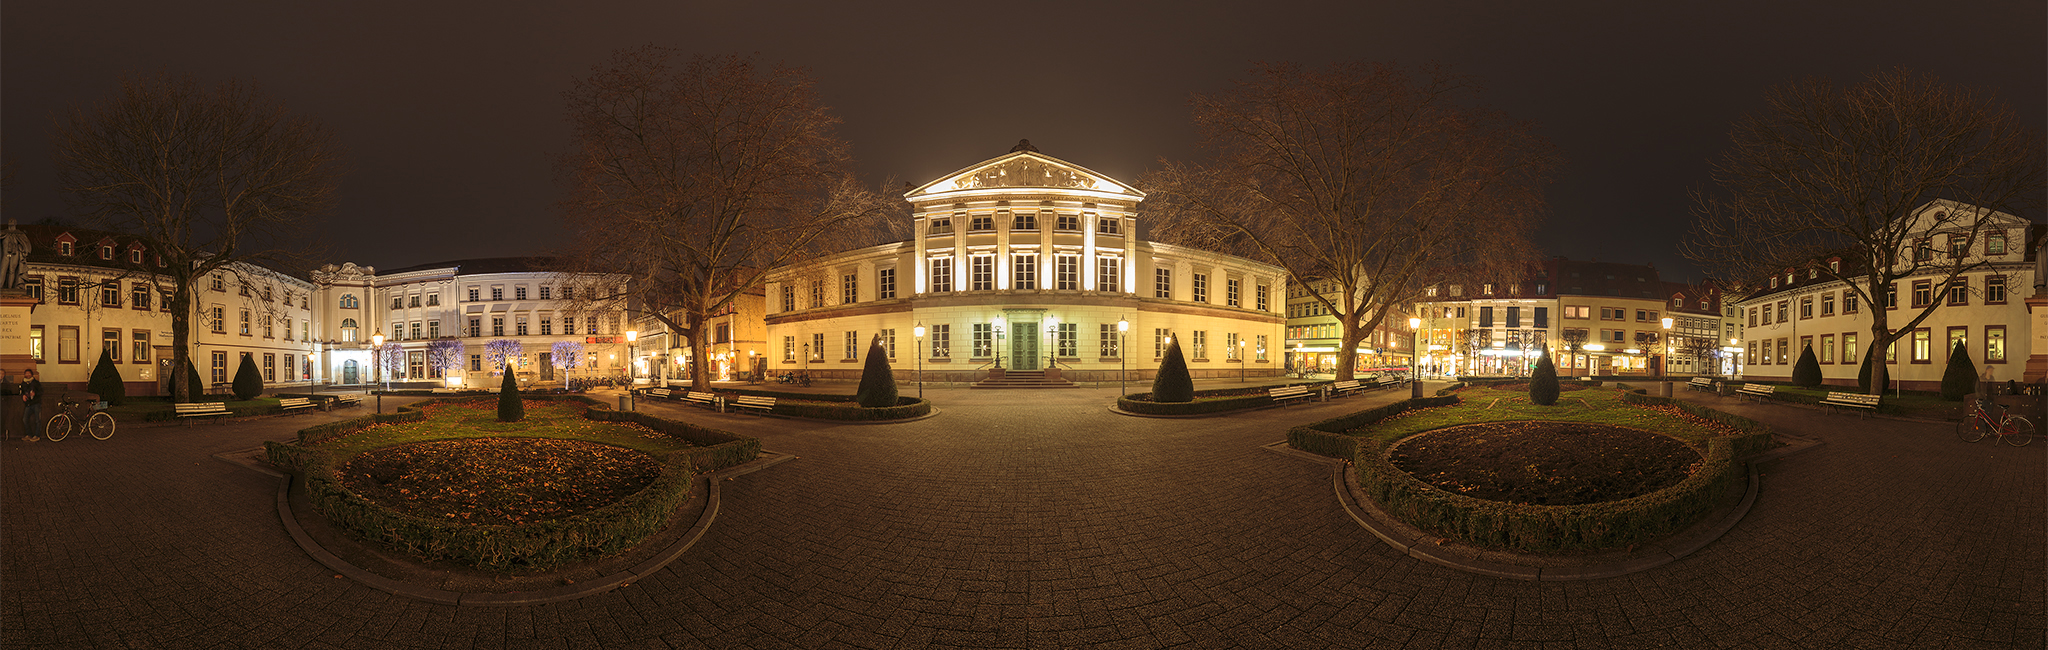 360 Grad Panorama Foto Wilhelmsplatz Göttingen | Fotograf Göttingen